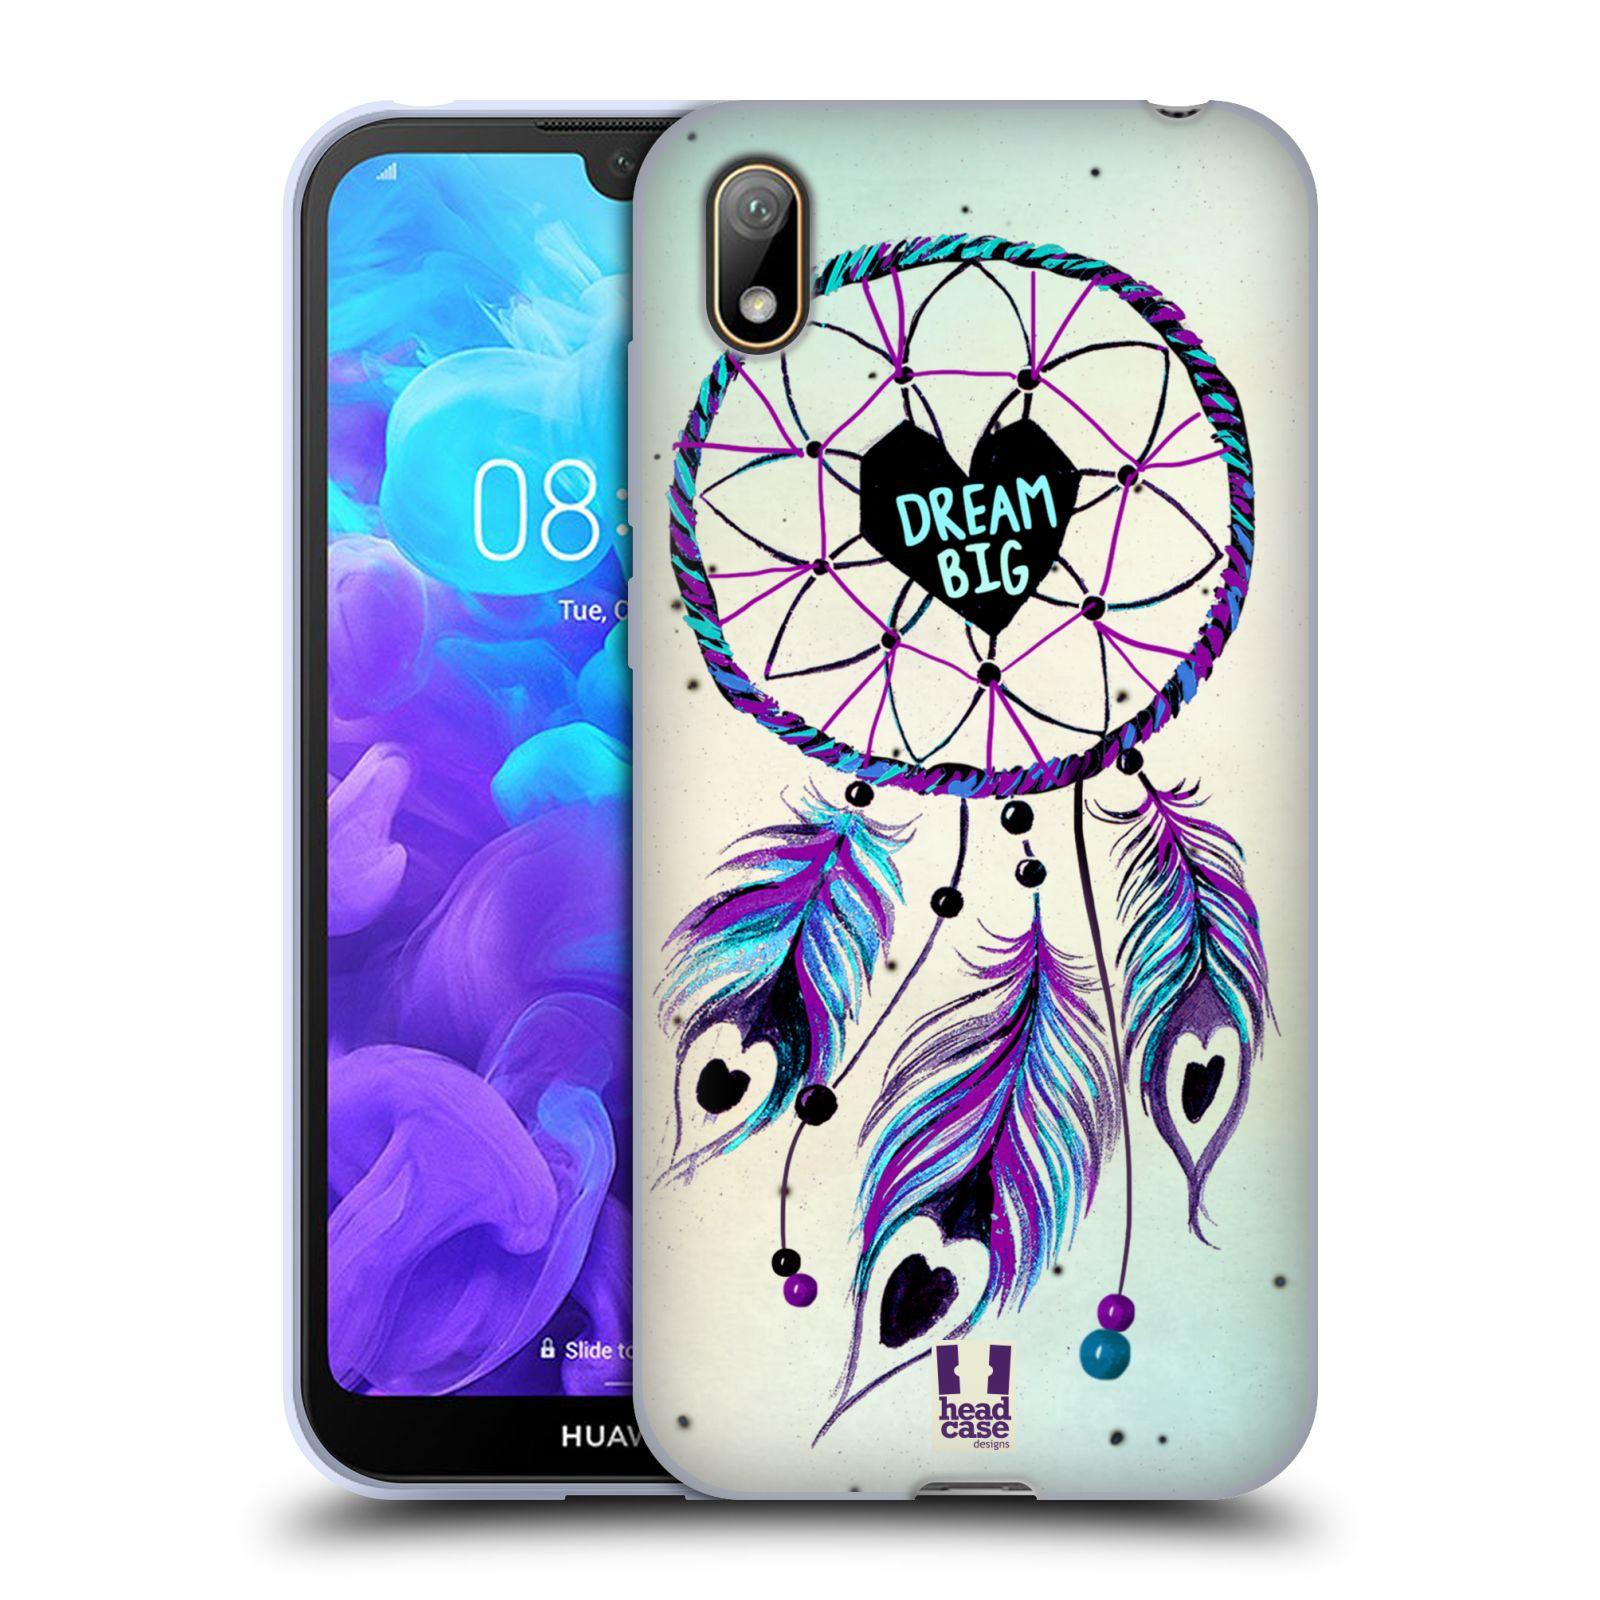 Silikonové pouzdro na mobil Huawei Y5 (2019) - Head Case - Lapač Assorted Dream Big Srdce